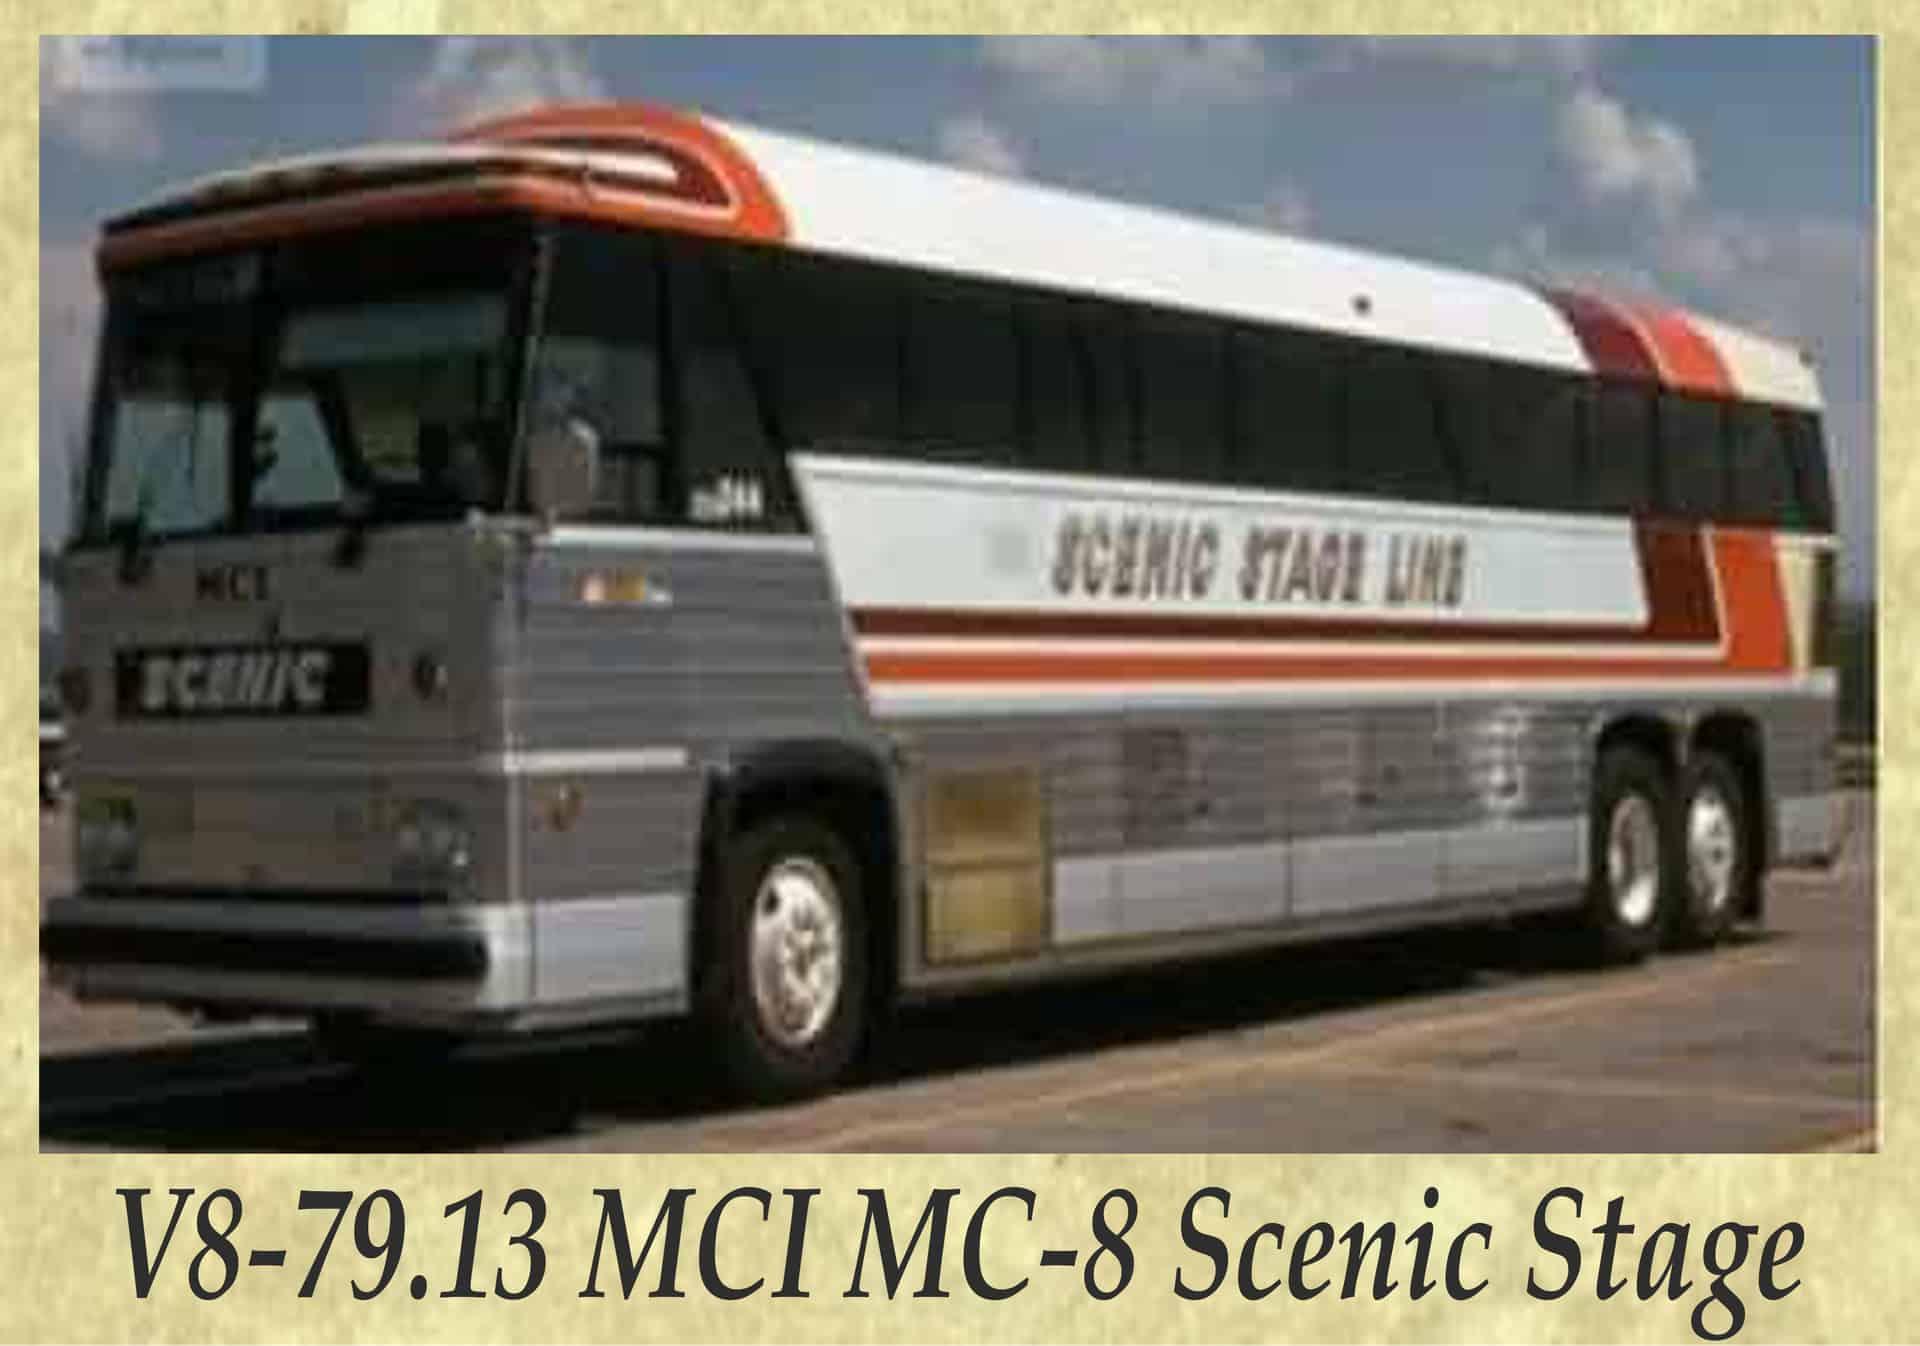 V8-79.13 MCI MC-8 Scenic Stage